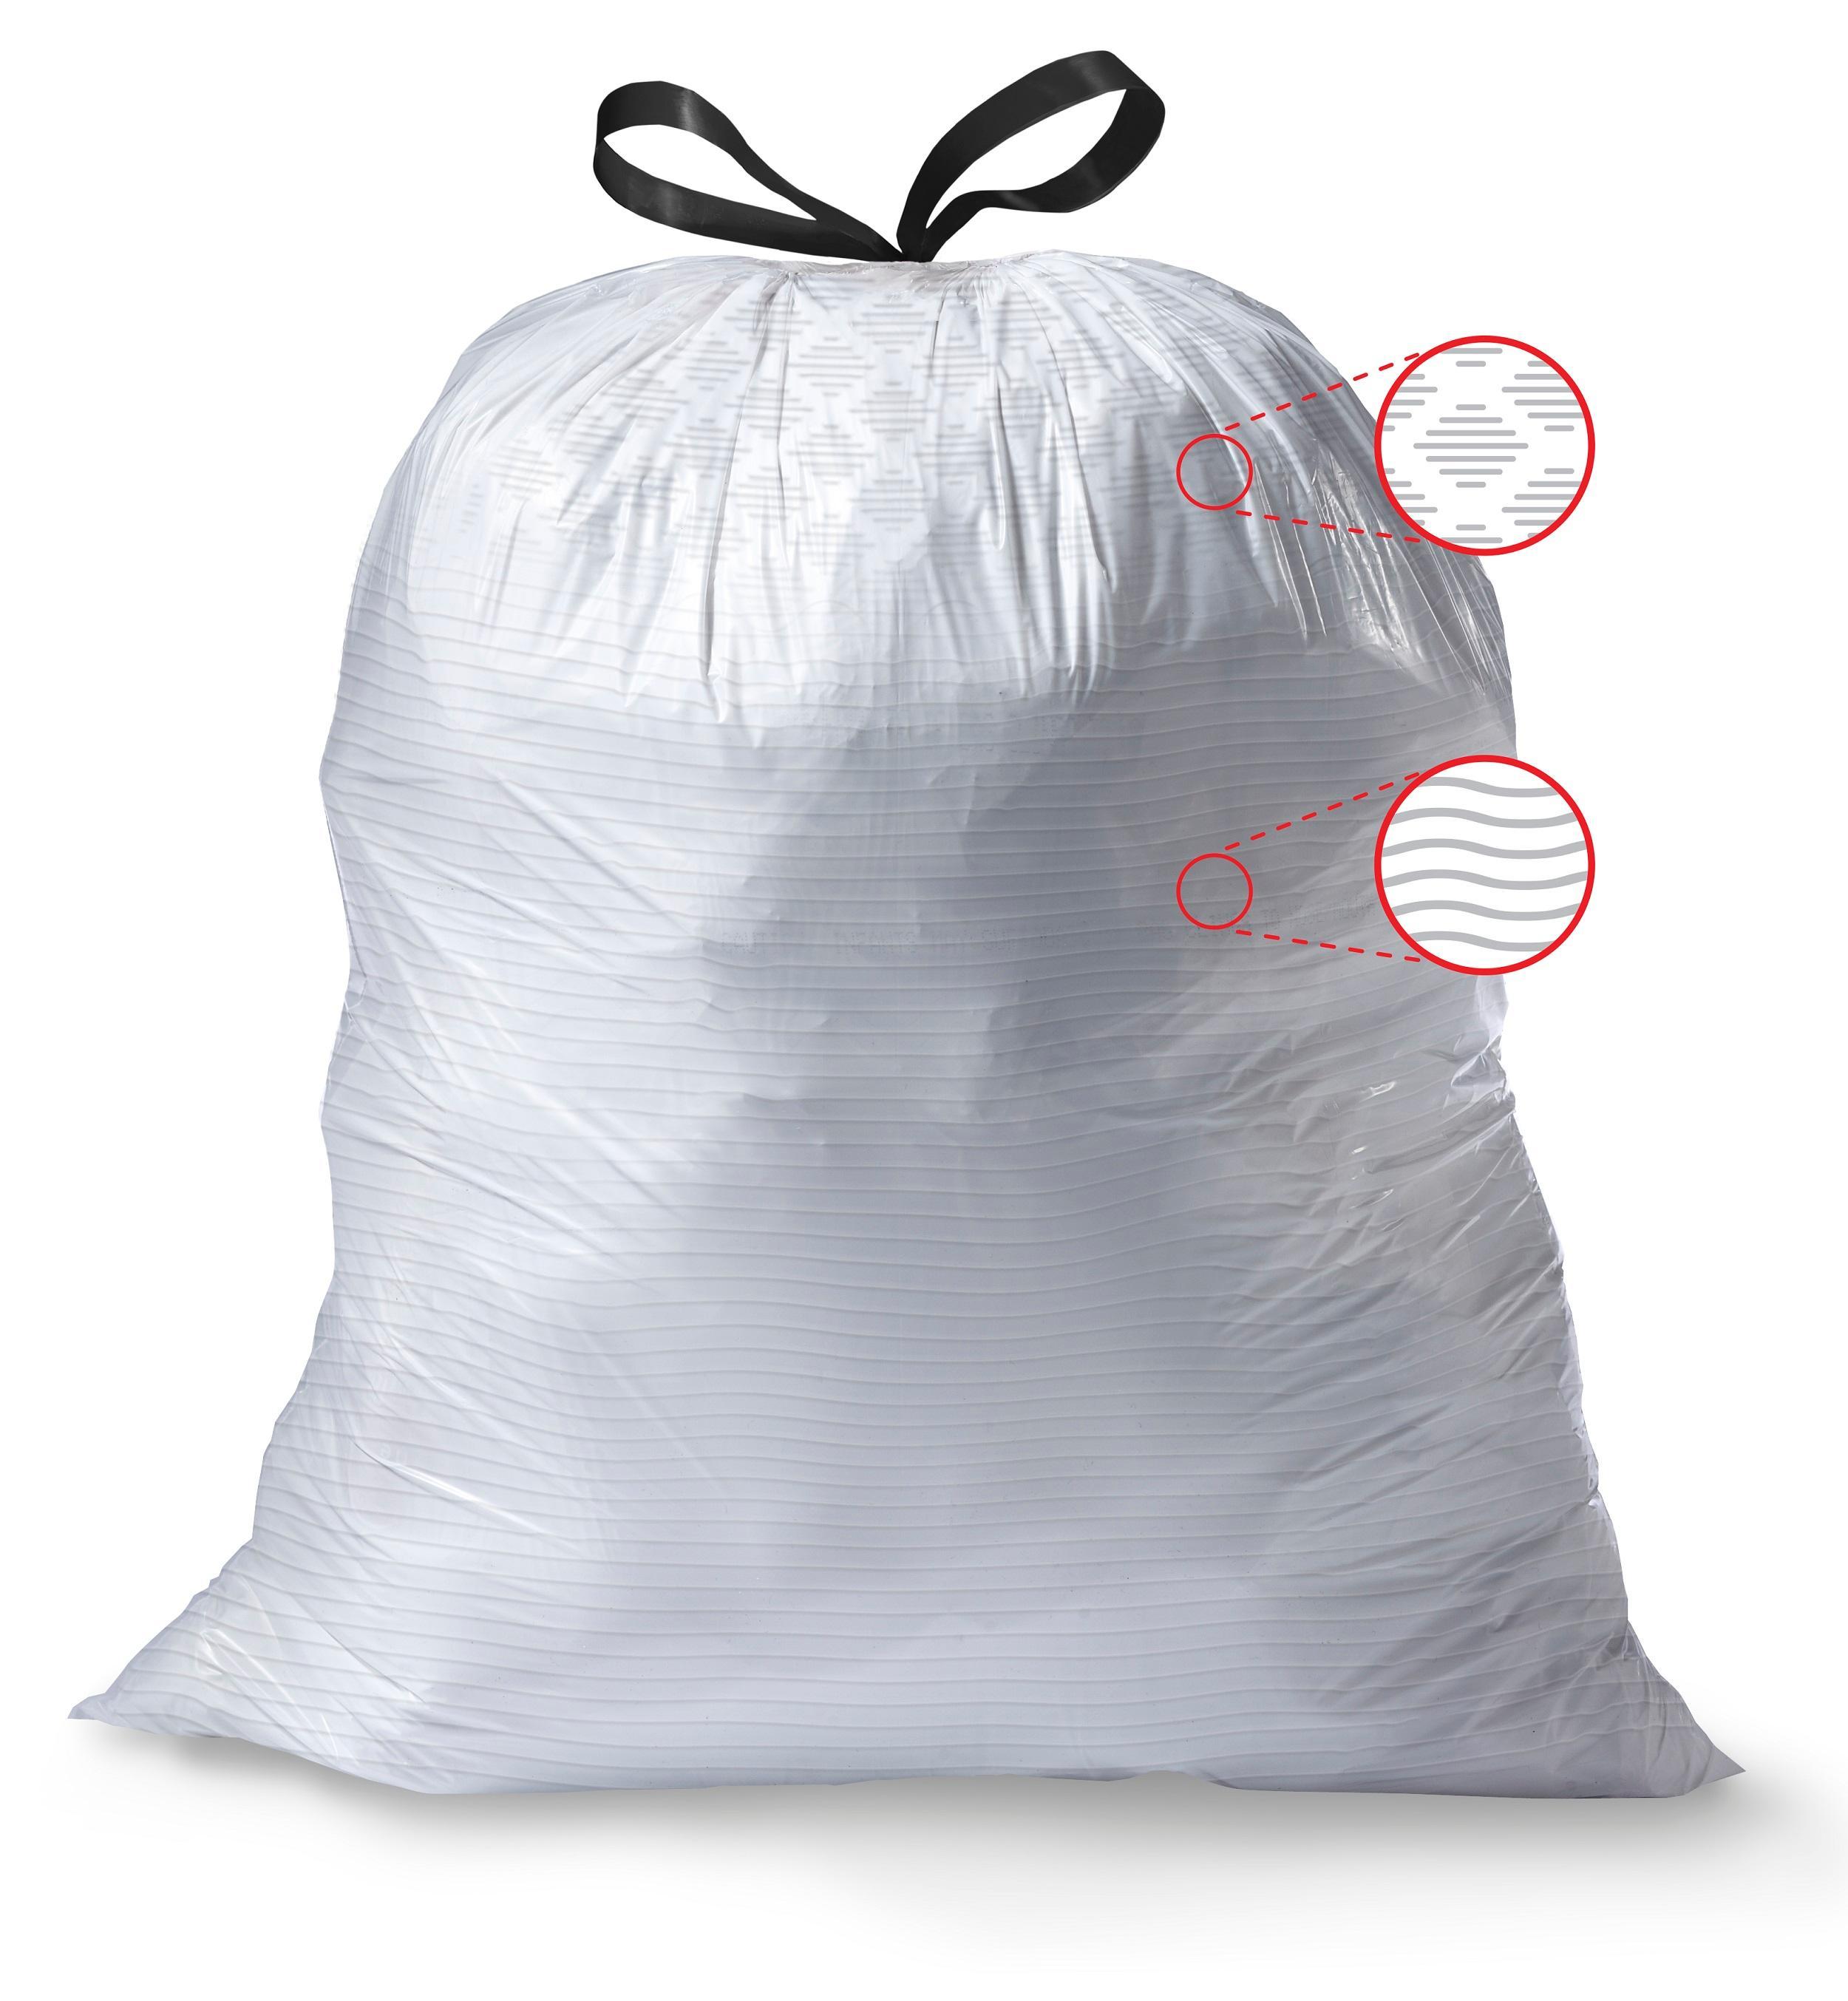 Glad Odorshield Fresh Clean Tall Kitchen Trash Garbage